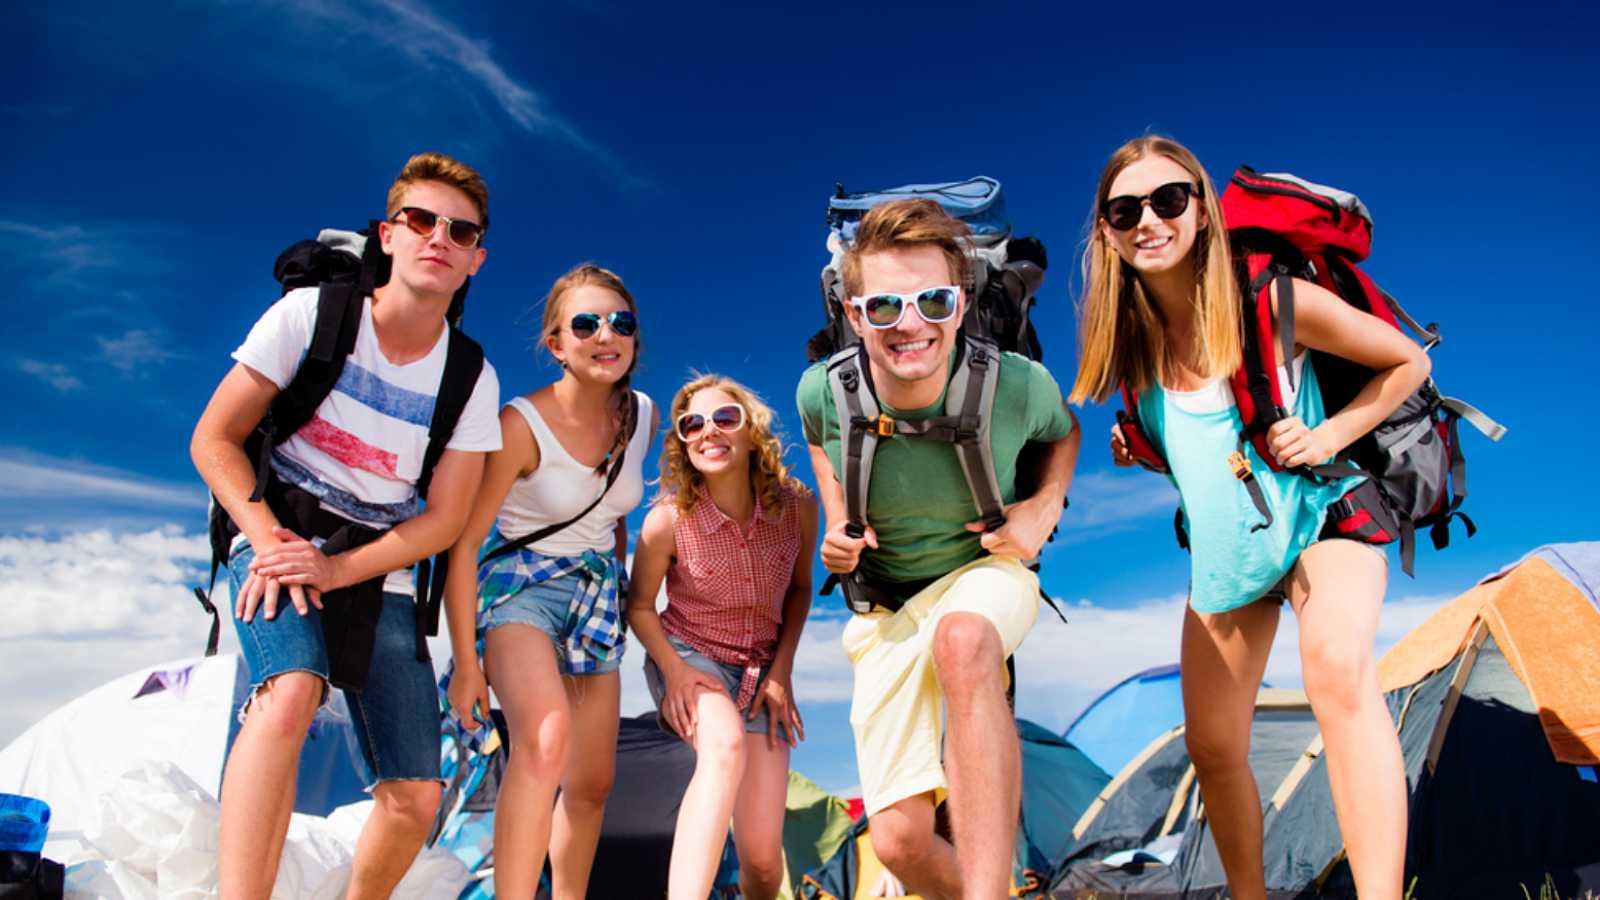 Du học hè: Từ 2-6 tuần tại Mỹ, Úc, Anh, Canada, Singapore & Philippines